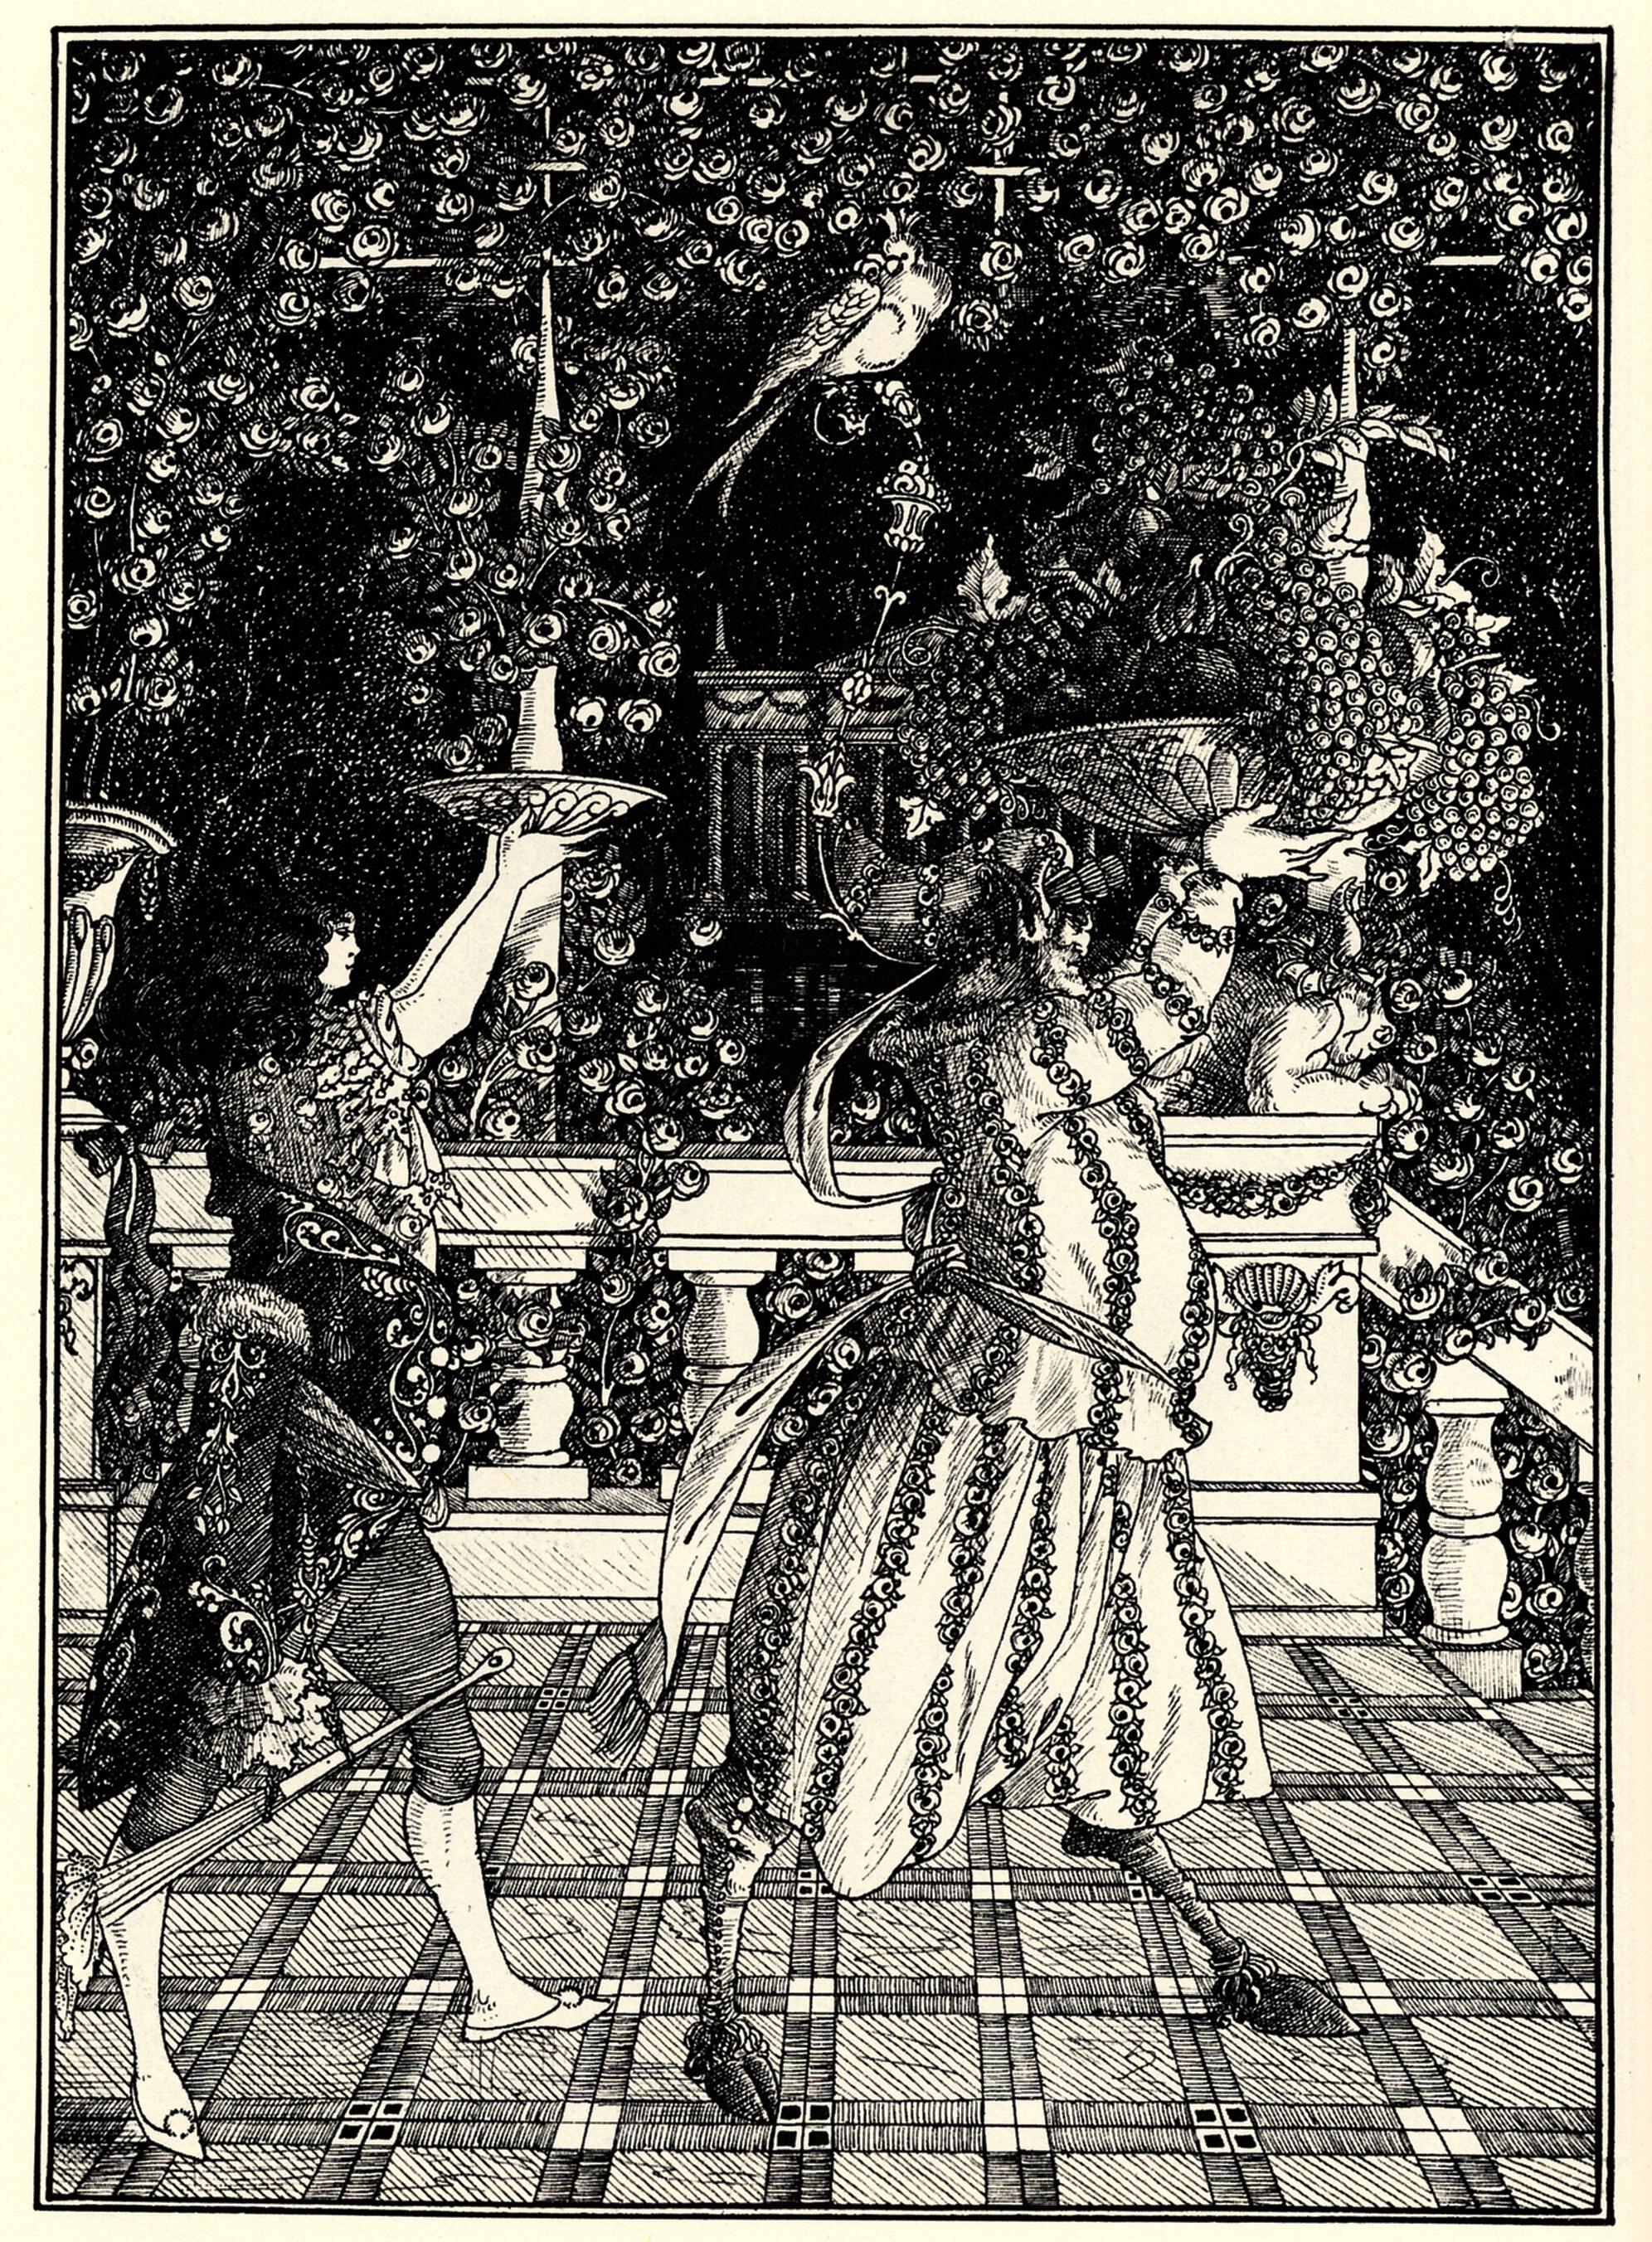 The Fruit Bearers, 1895 - 1896 - Aubrey Beardsley ...